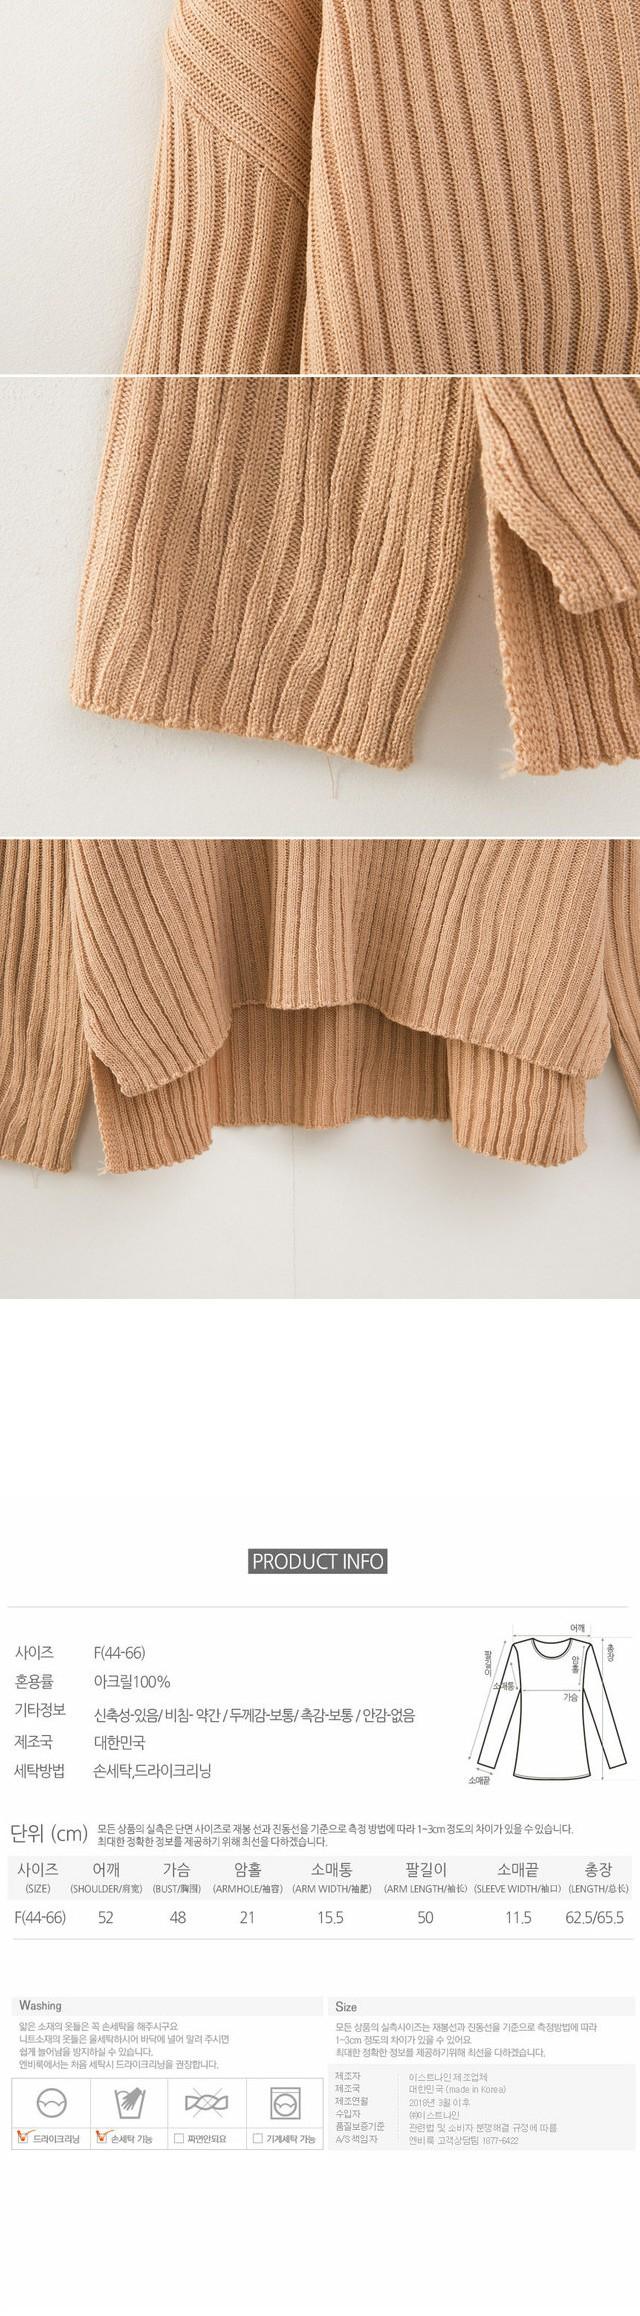 Knit Maple